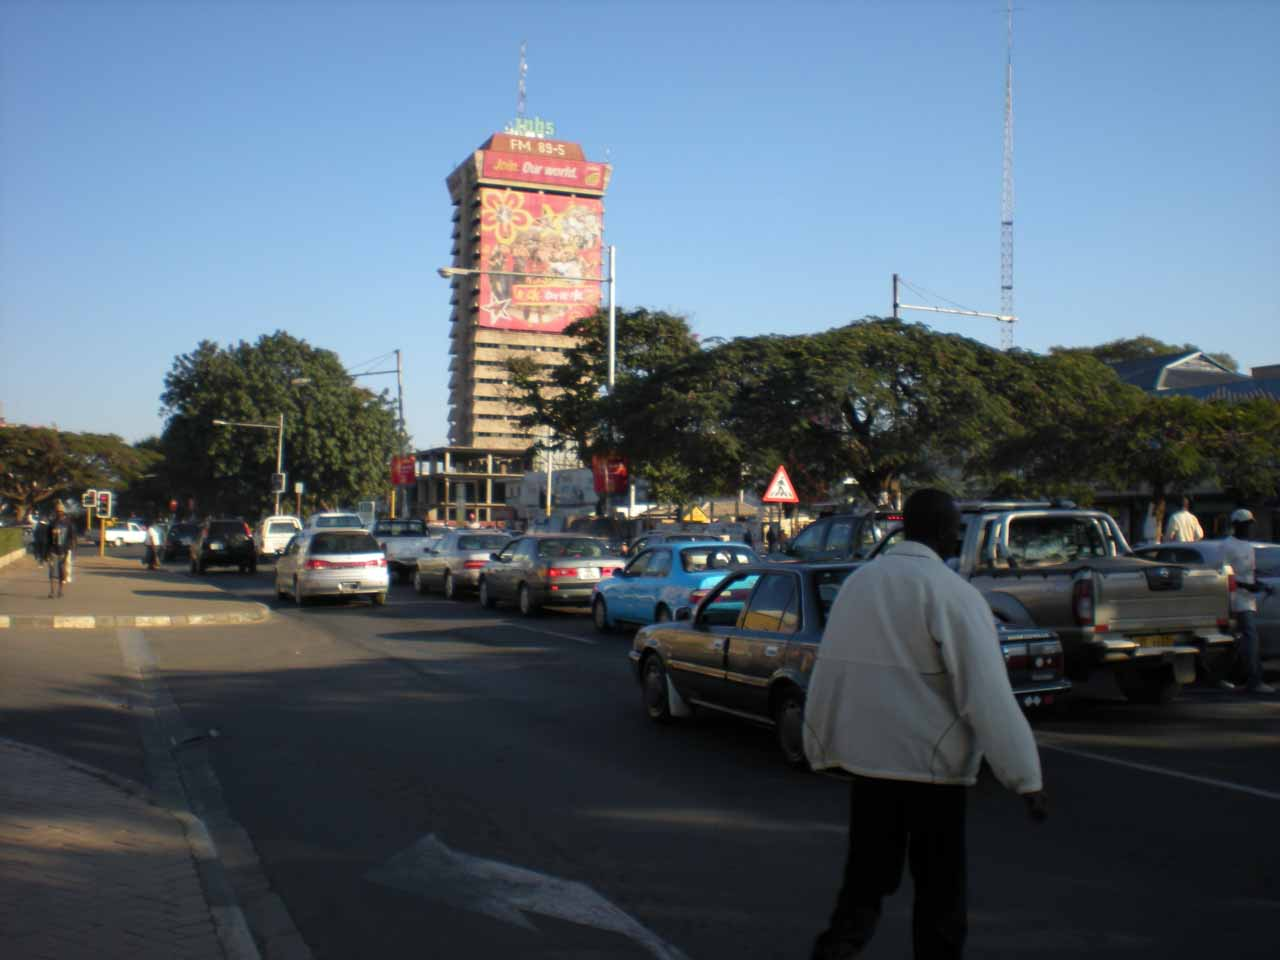 Within the traffic of Lusaka